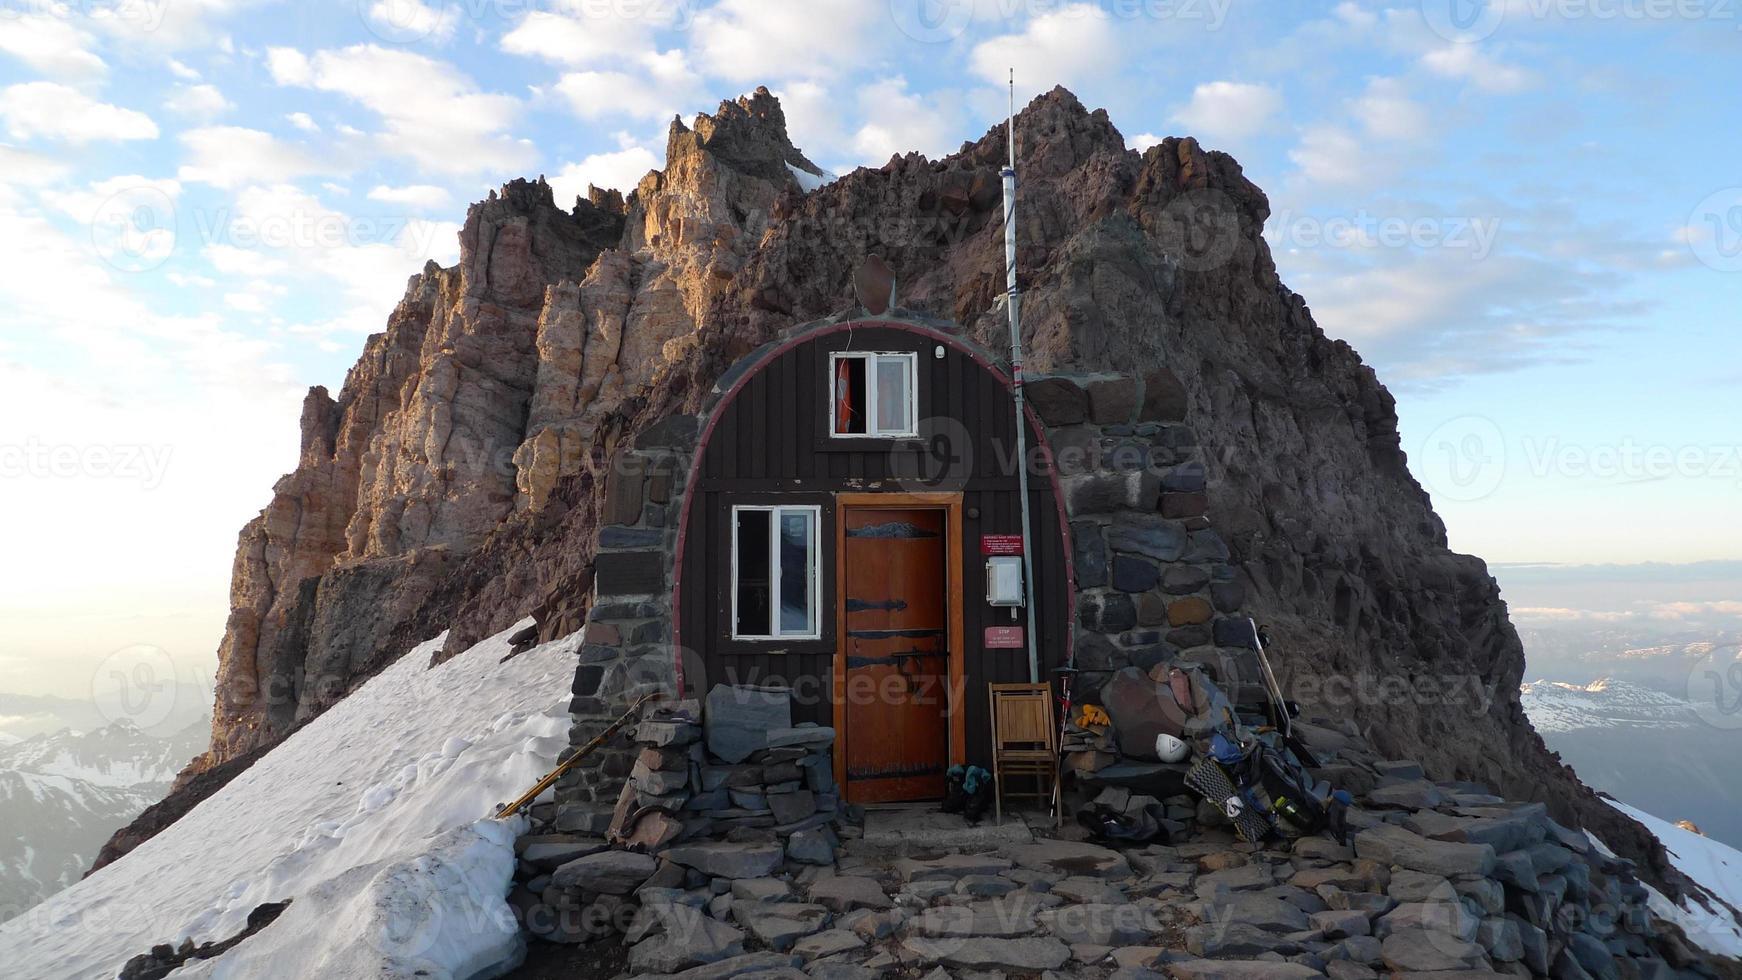 Mount Rainier Camp Schurman photo